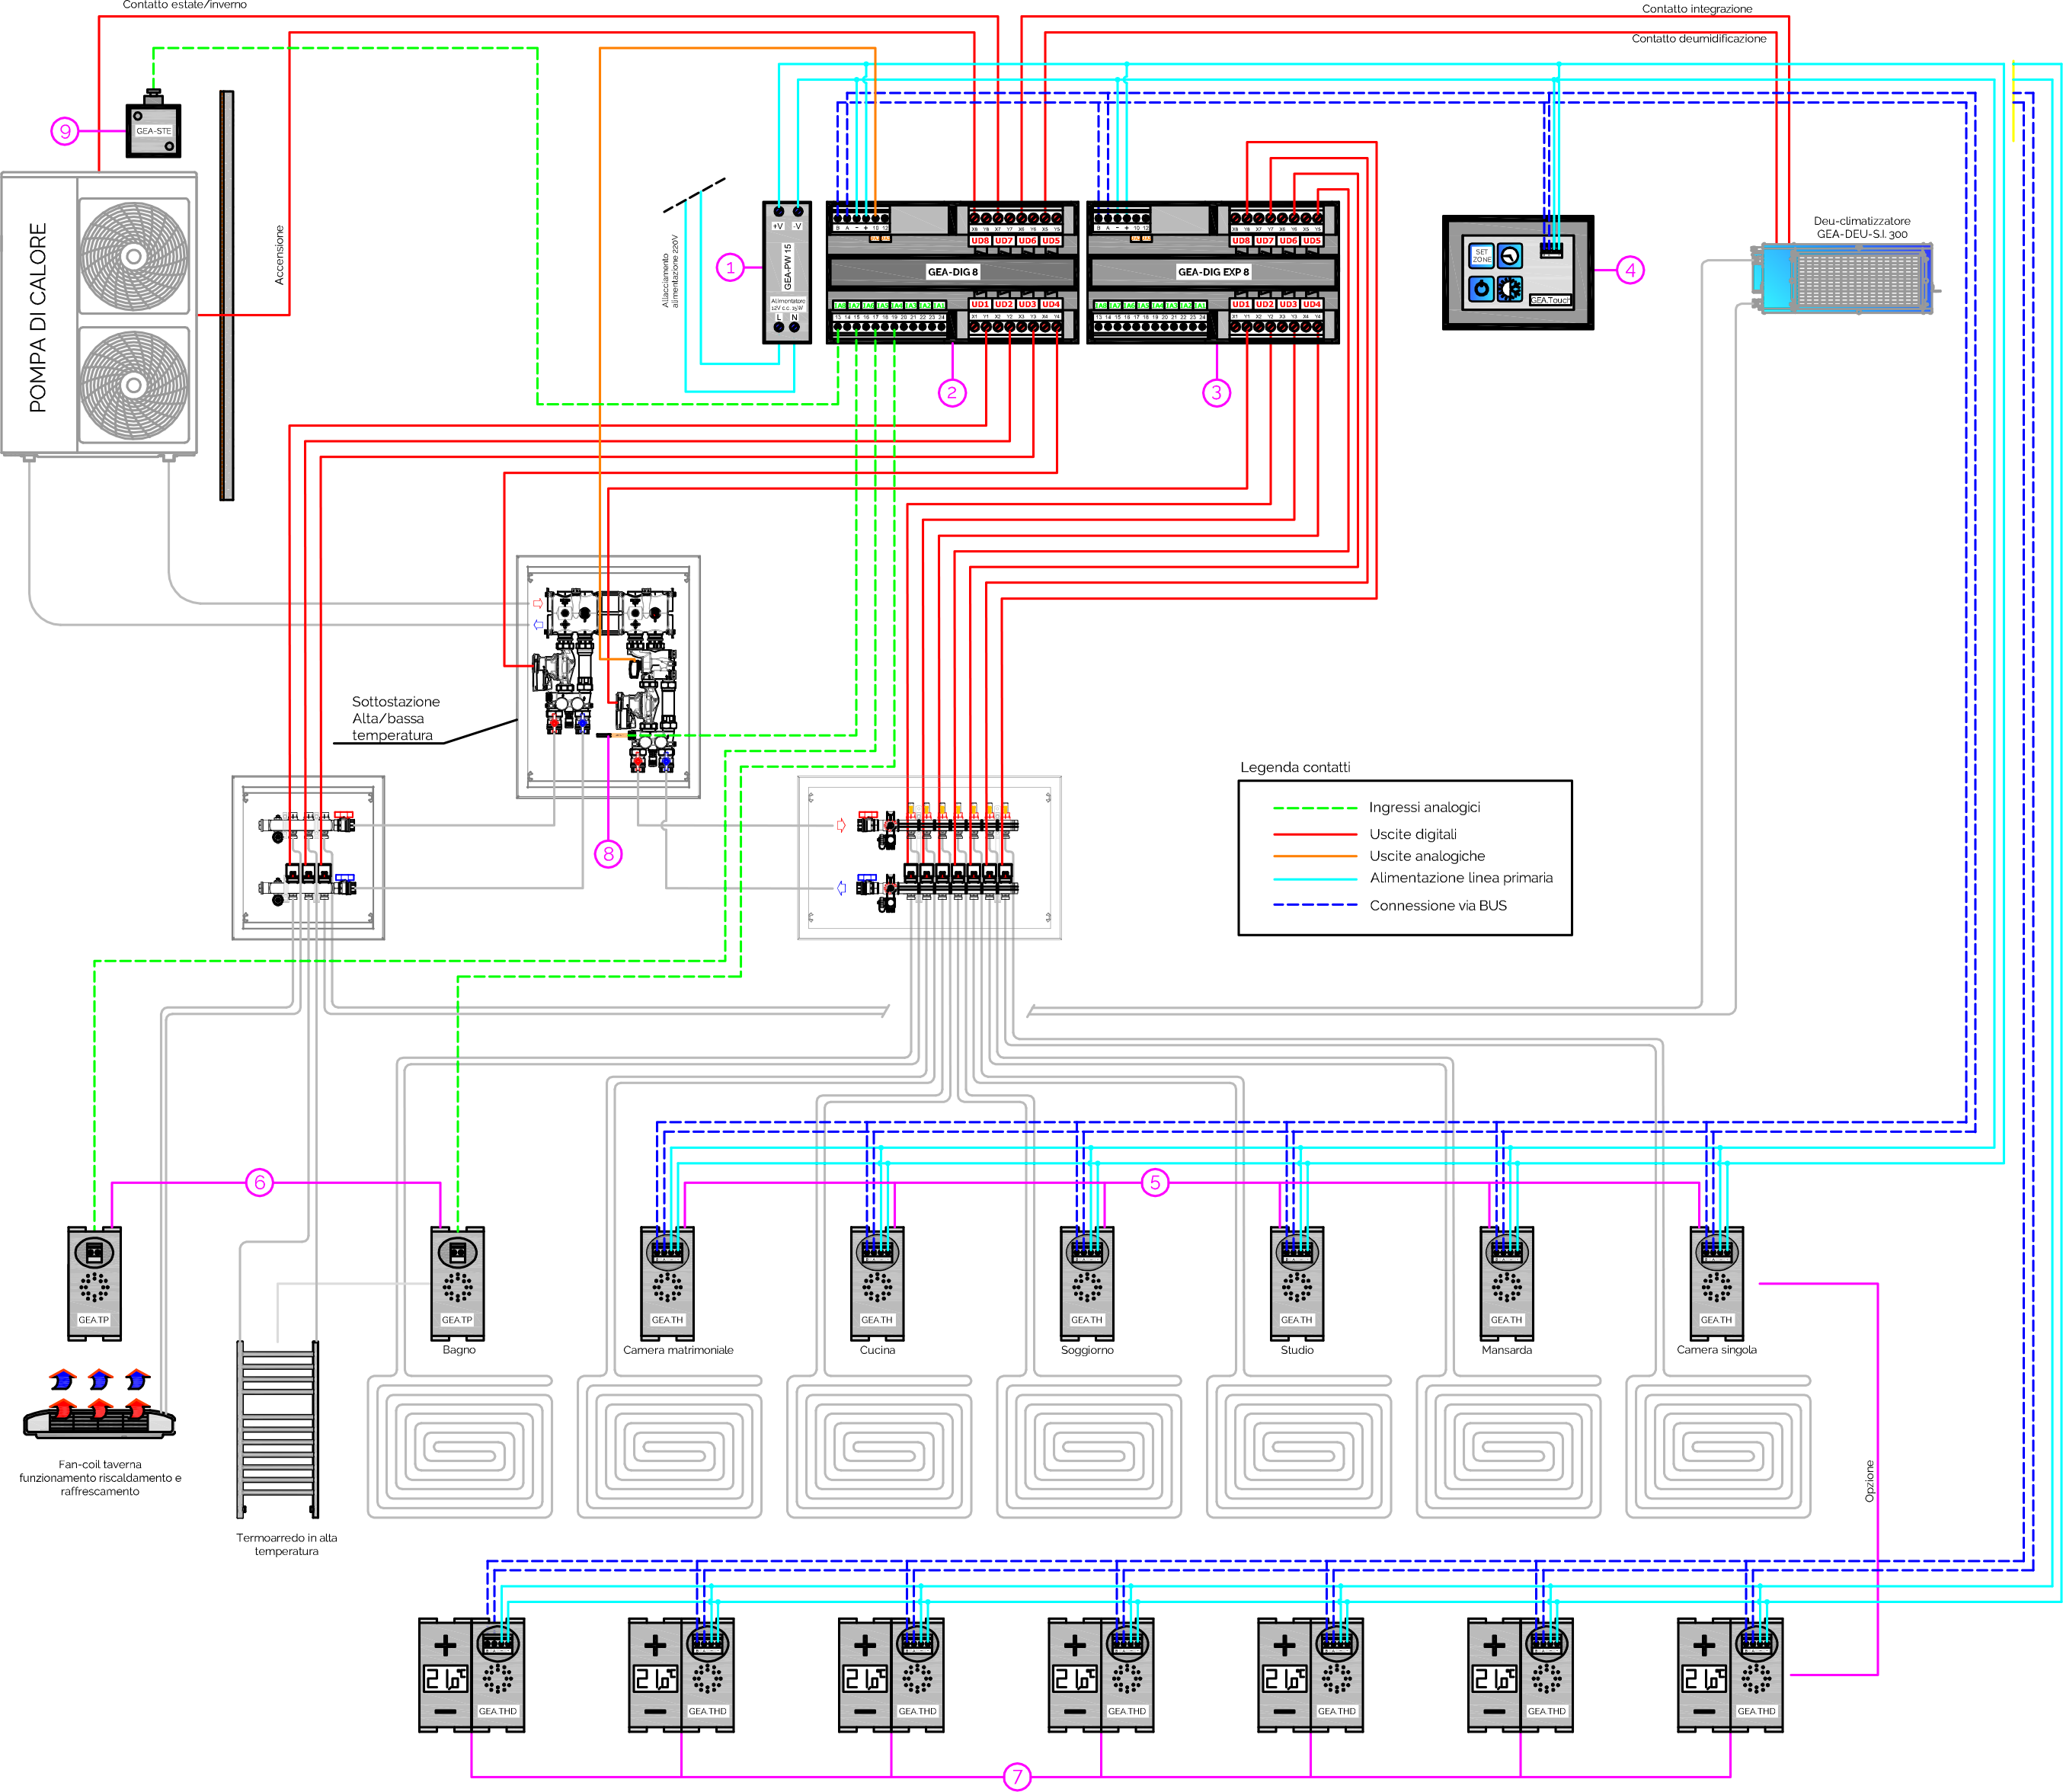 Temperatura Caldaia Impianto A Pavimento impianti raffrescamento | geatherm